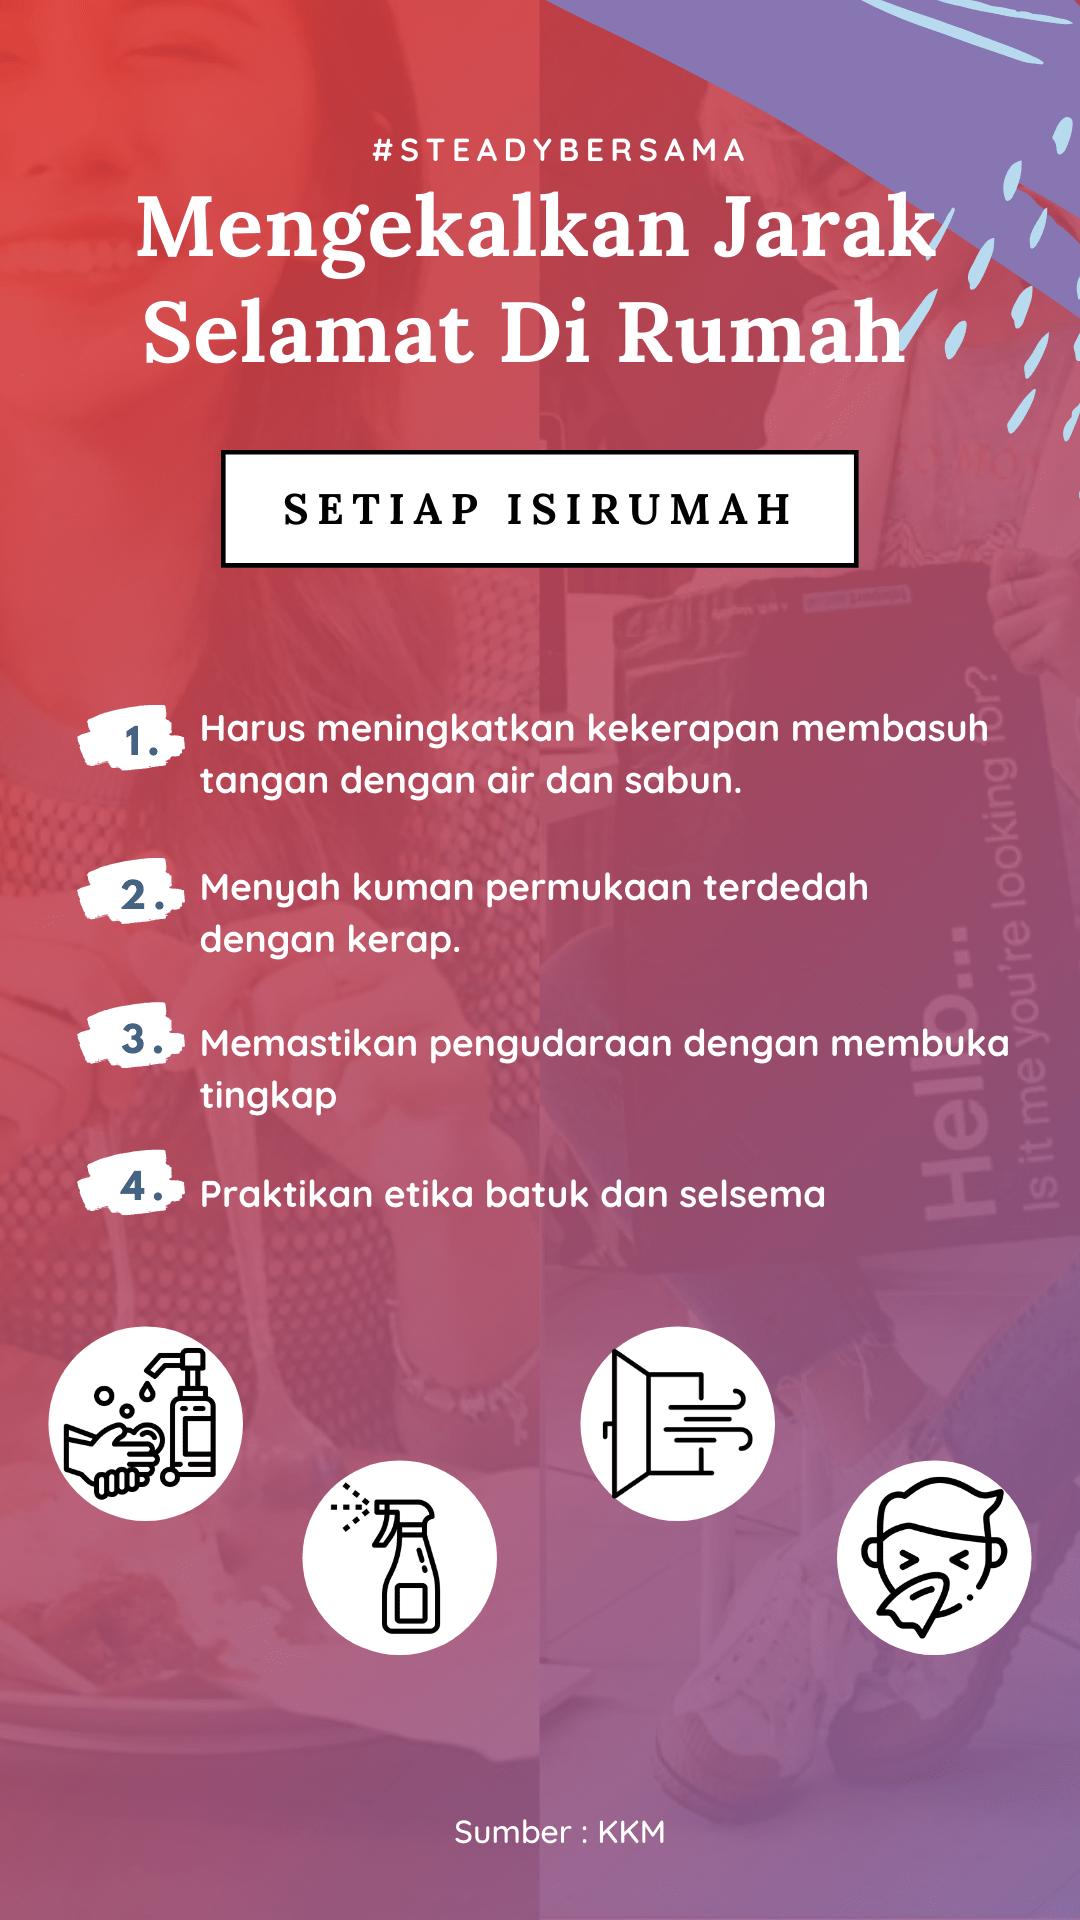 Material - SushiVid+Covid+19+Aid+-+social-distancing-all+(Malay)